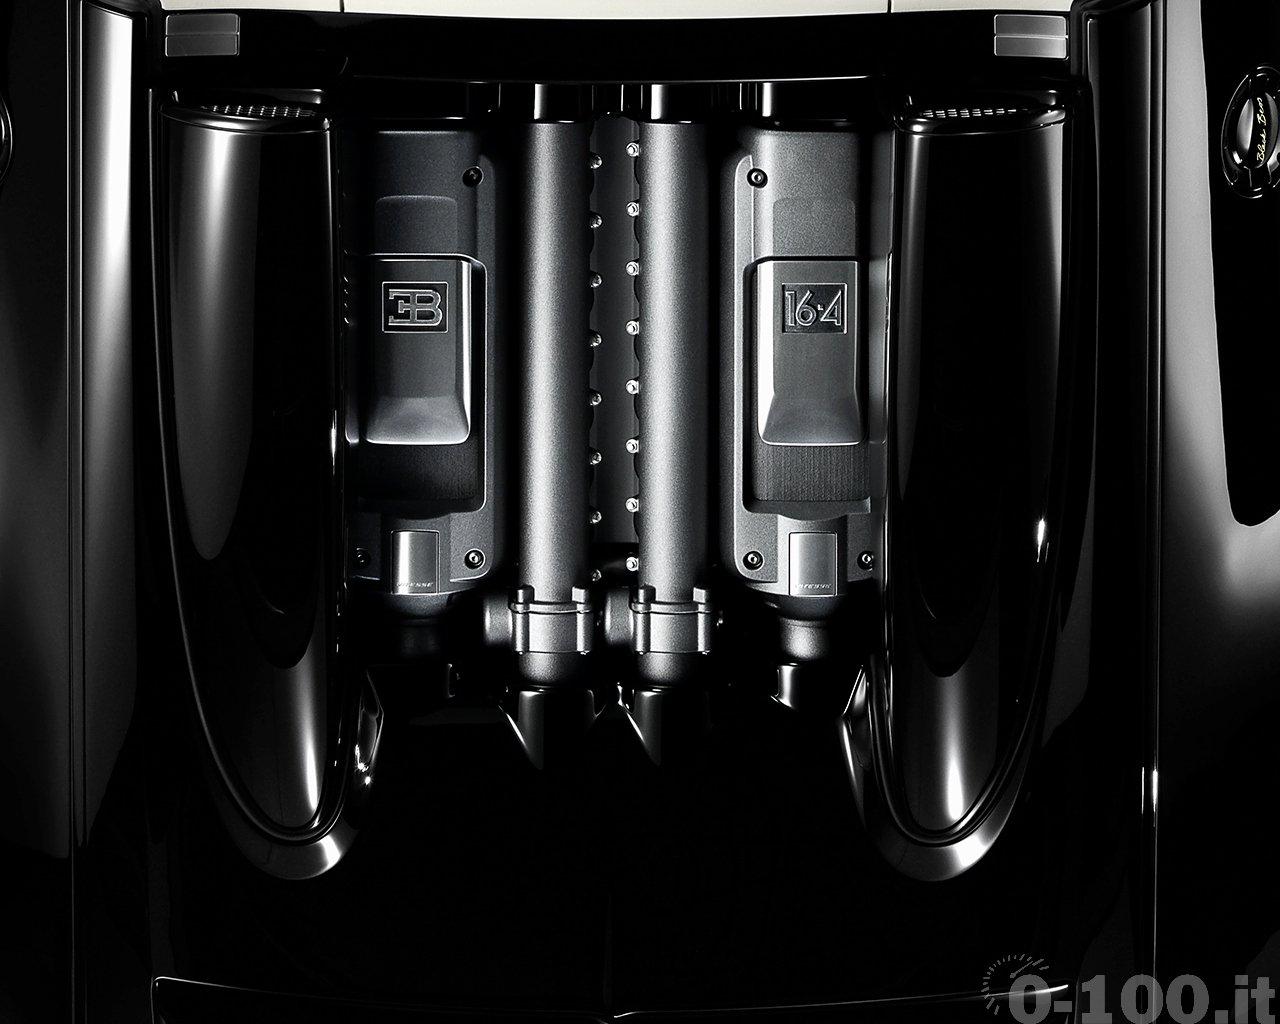 beijing-2014-bugatti-veyron-serie-speciale-les-legendes-de-bugatti-veyron-16-4-grand-sport-vitesse-black-bess_25